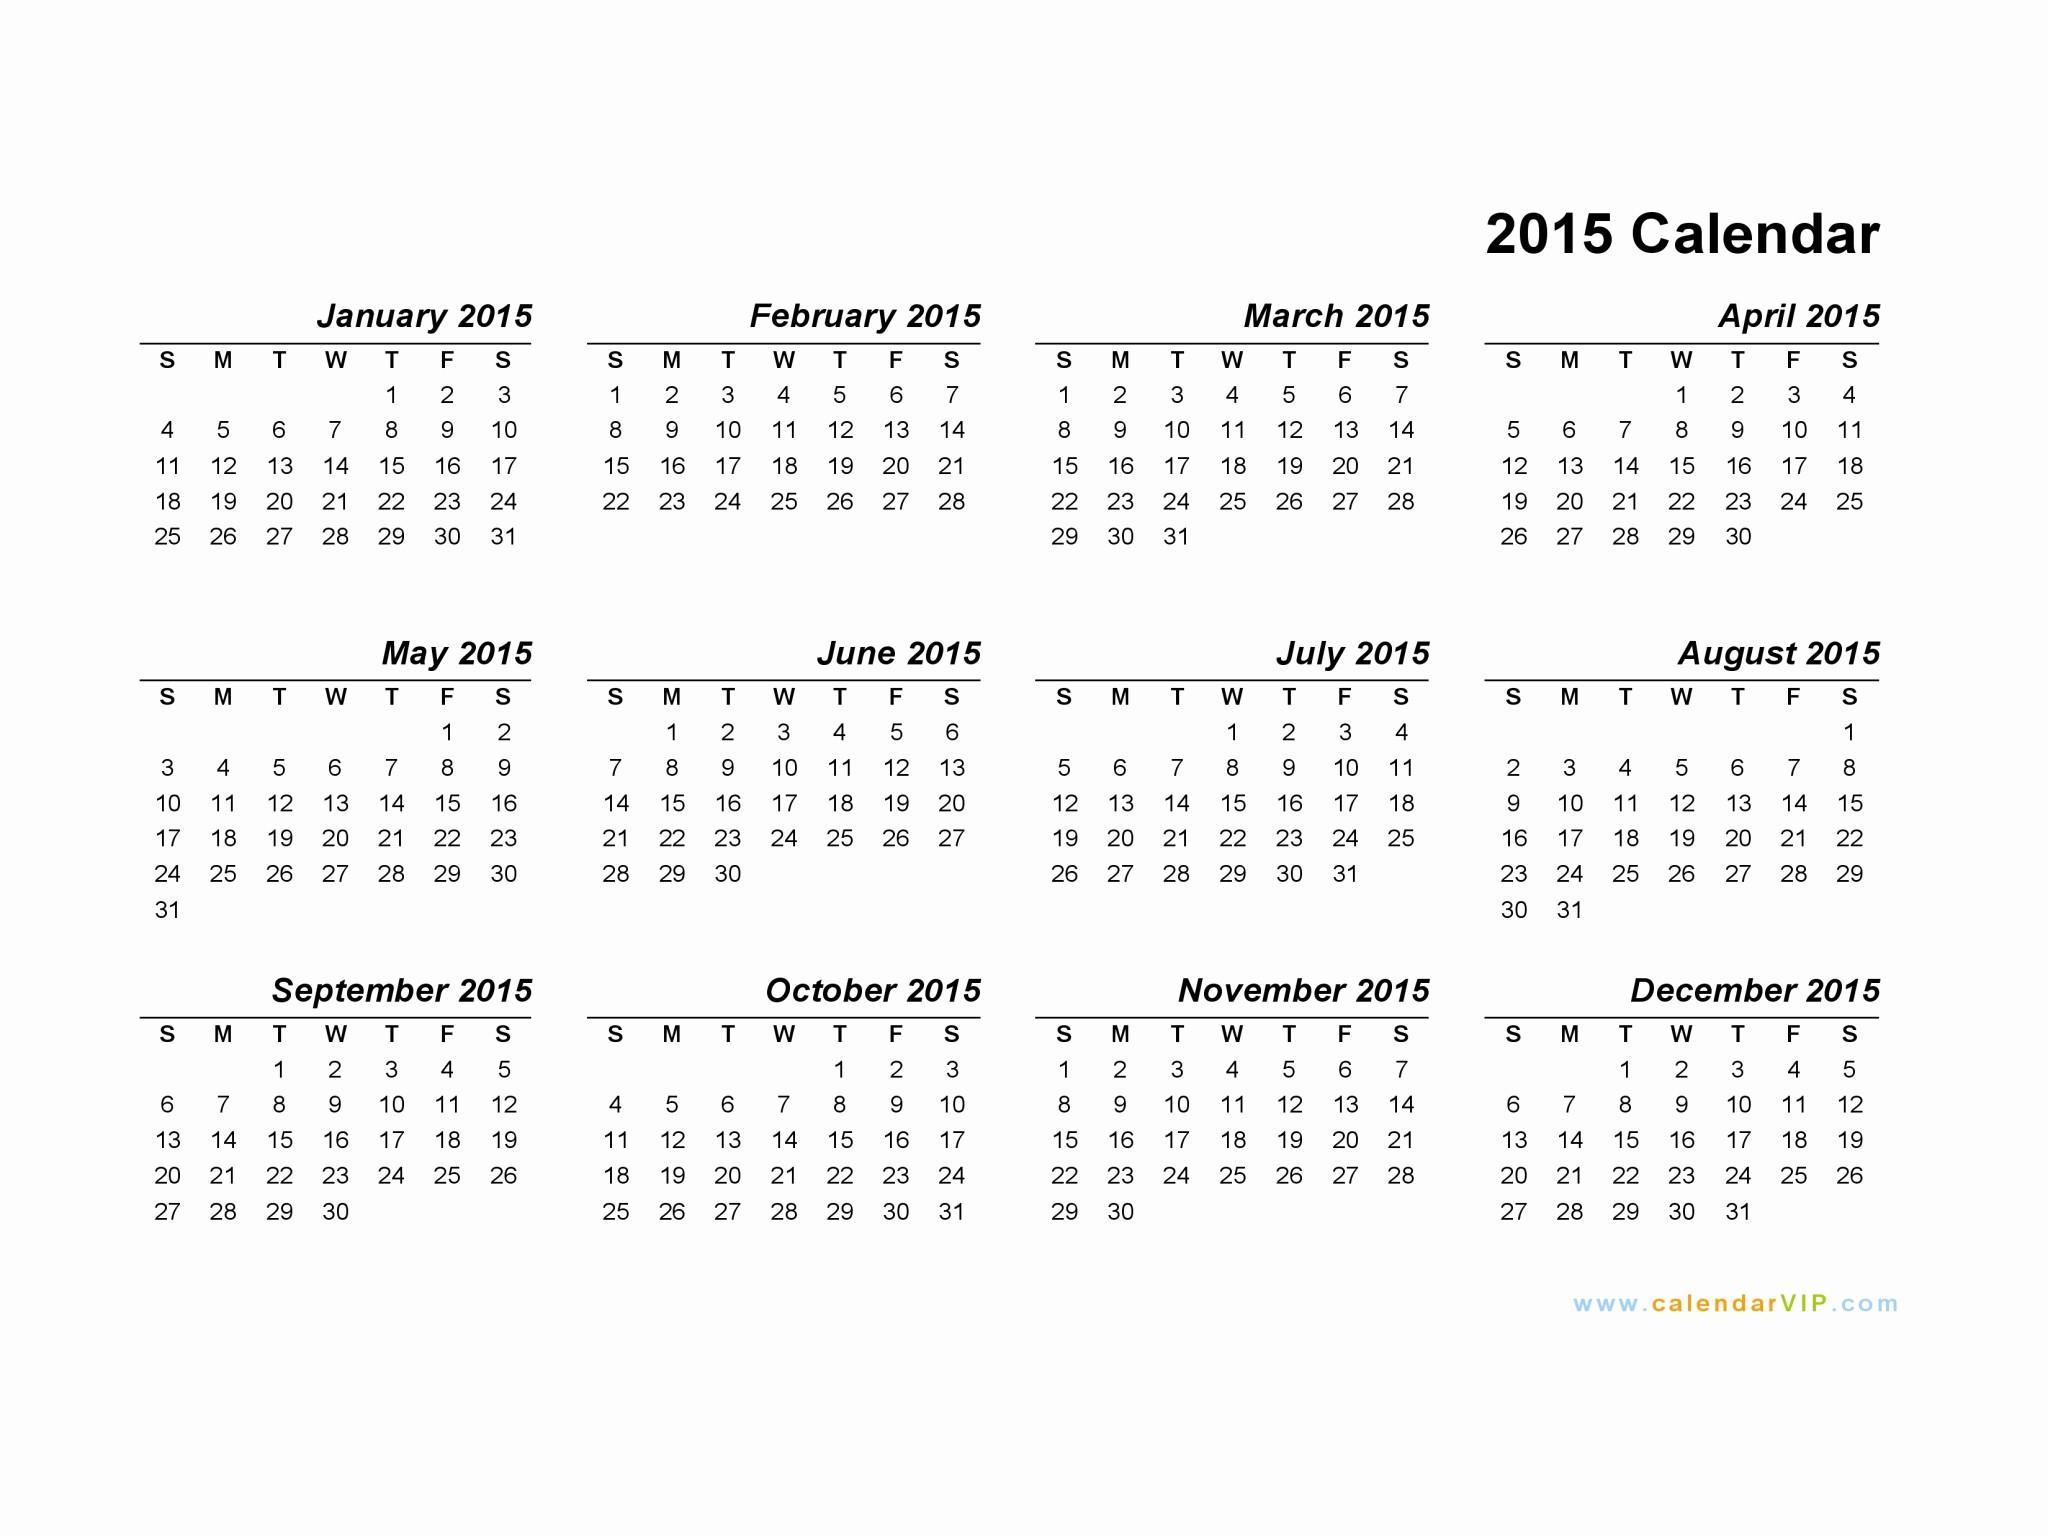 2015 Yearly Calendar Printable Landscape Beautiful 2015 Calendar Blank Printable Calendar Template In Pdf